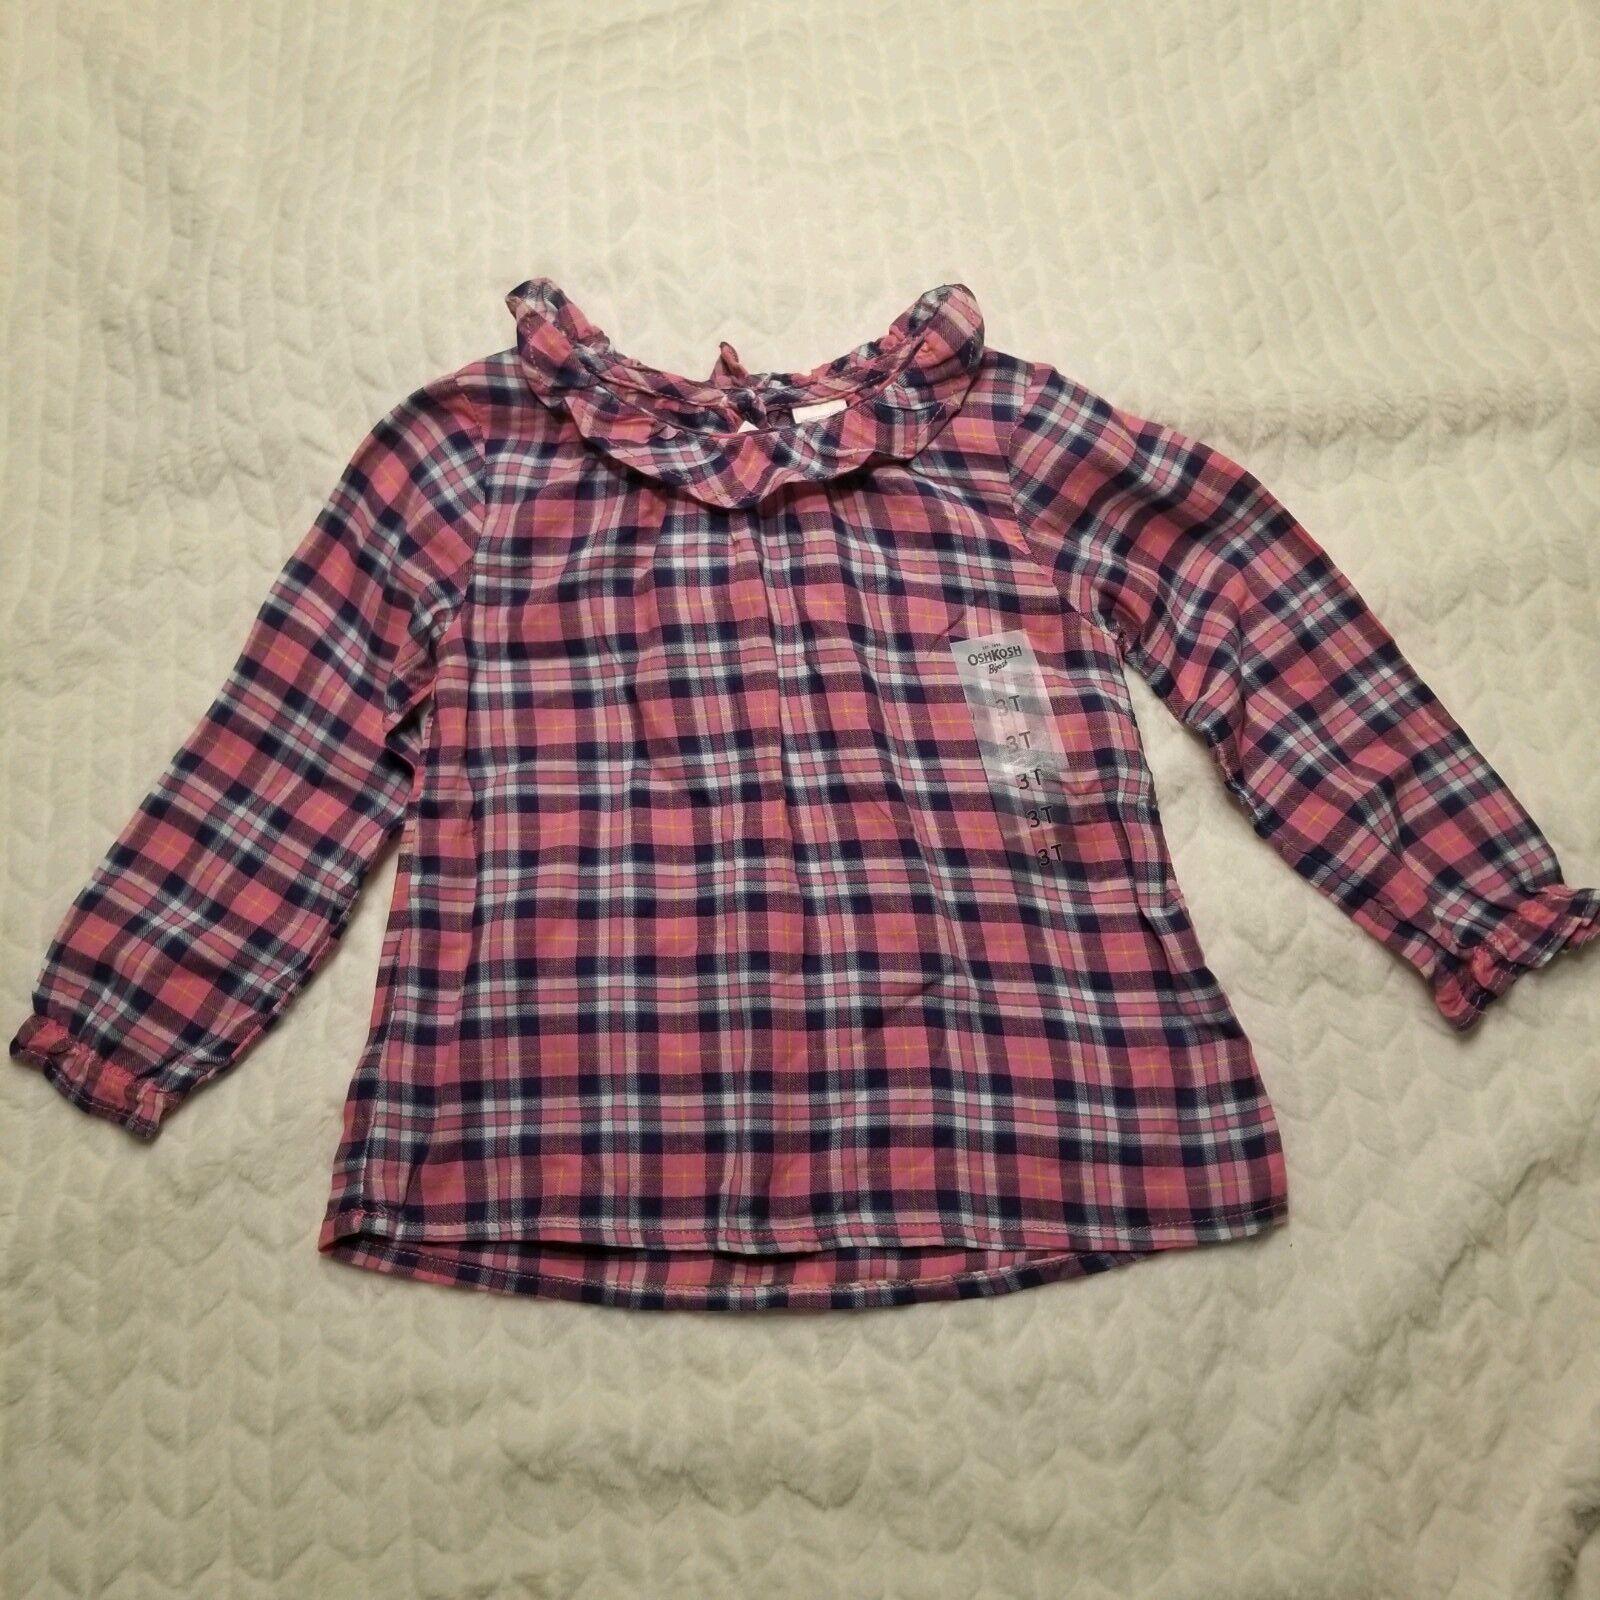 NWT ruffle top OshKosh B/'Gosh Infant Girls Navy and Pink Plaid Bodysuit